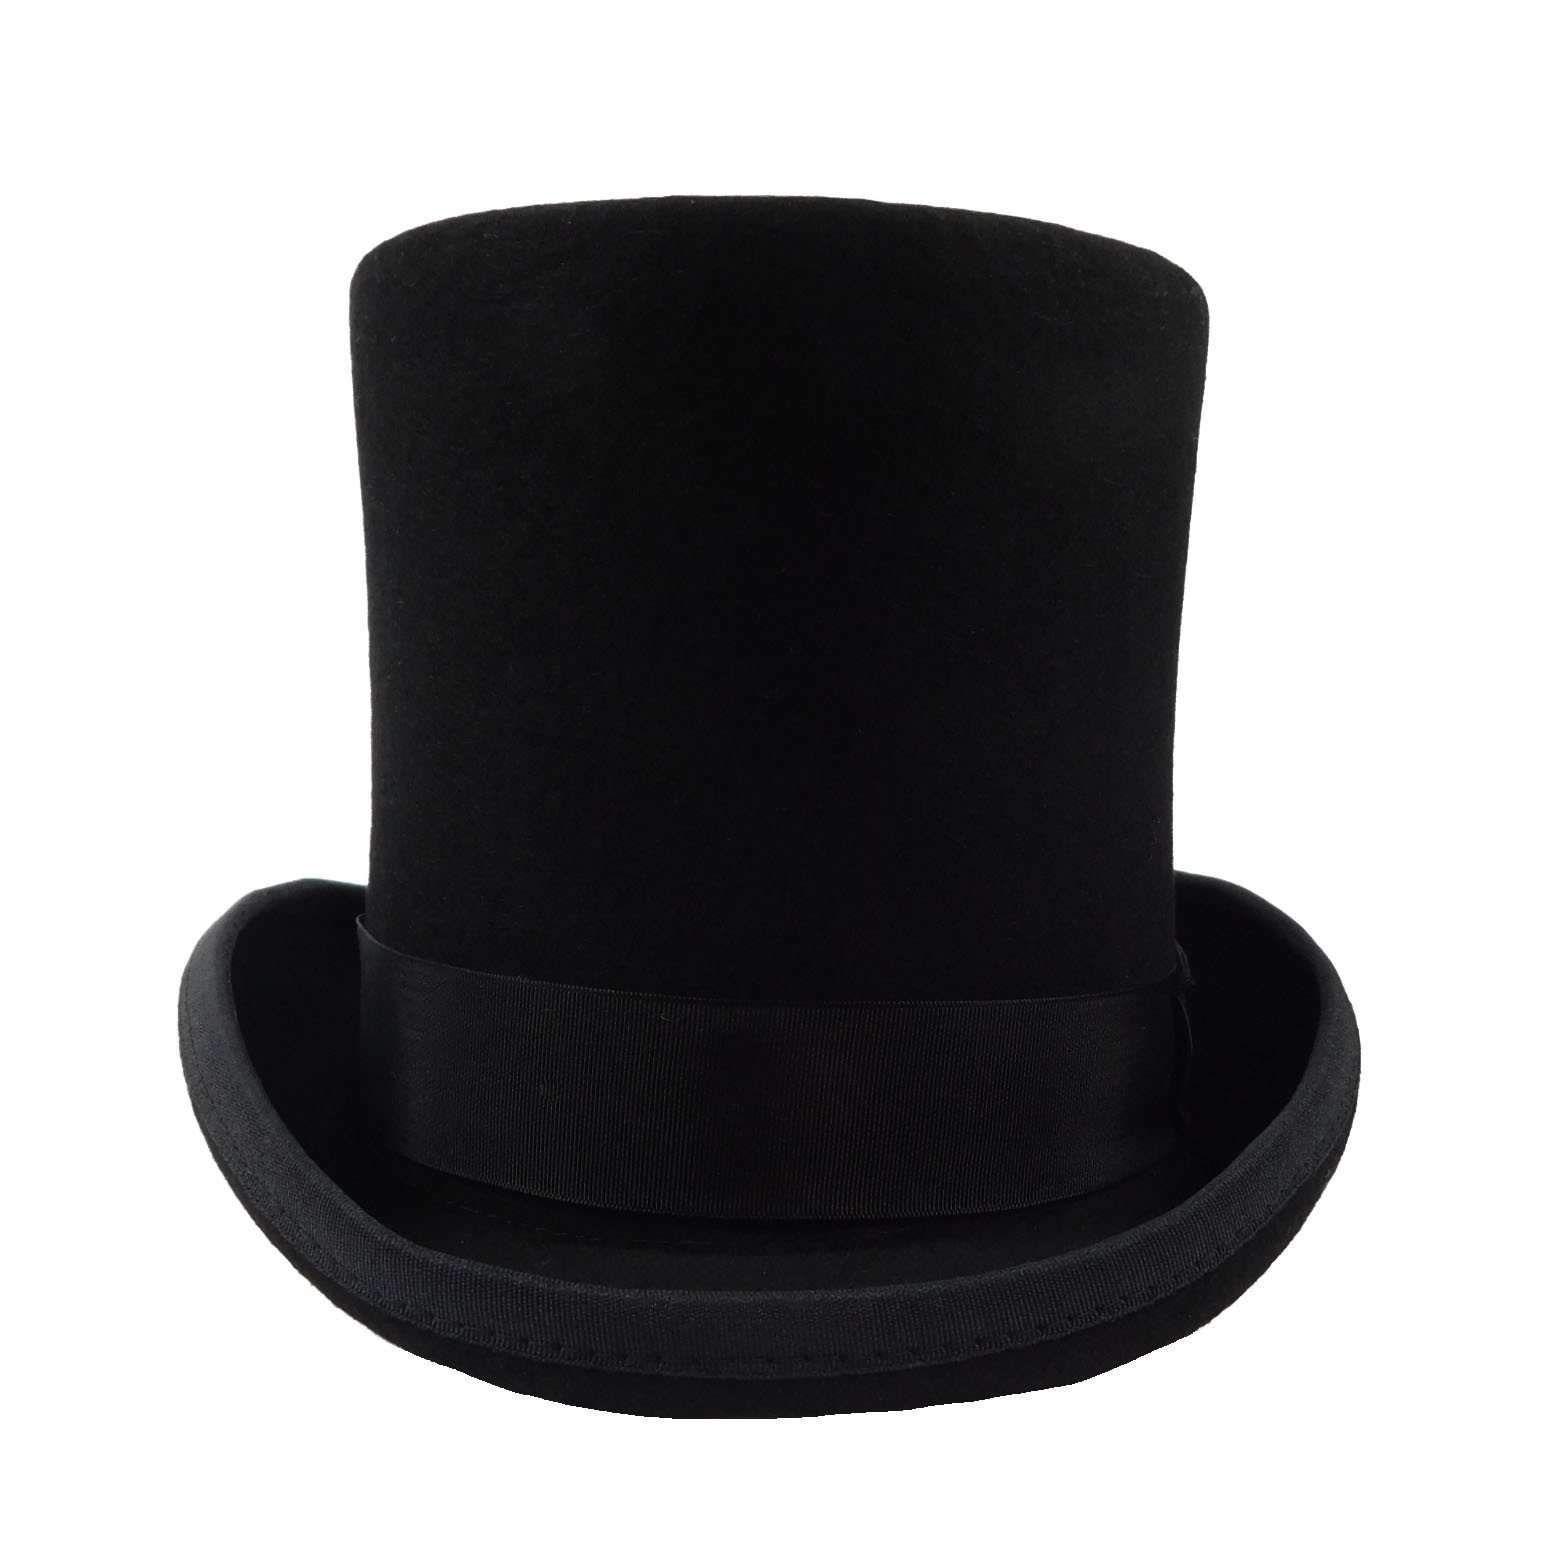 Tall Wool Felt Top Hat With Satin Lining Top Hat Hats Wool Felt